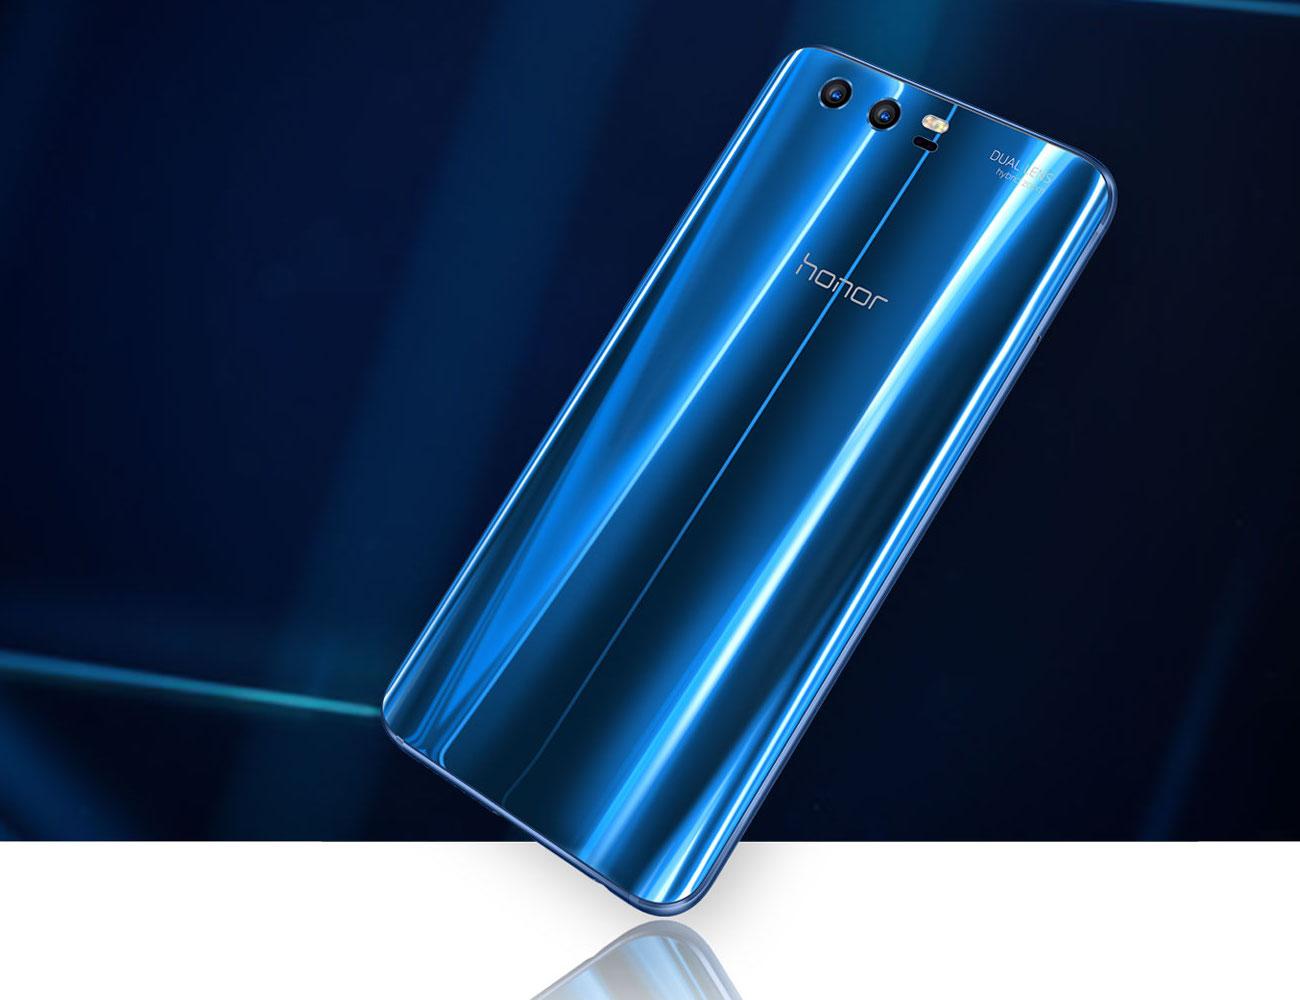 Huawei Honor 9 Stylish Smartphone